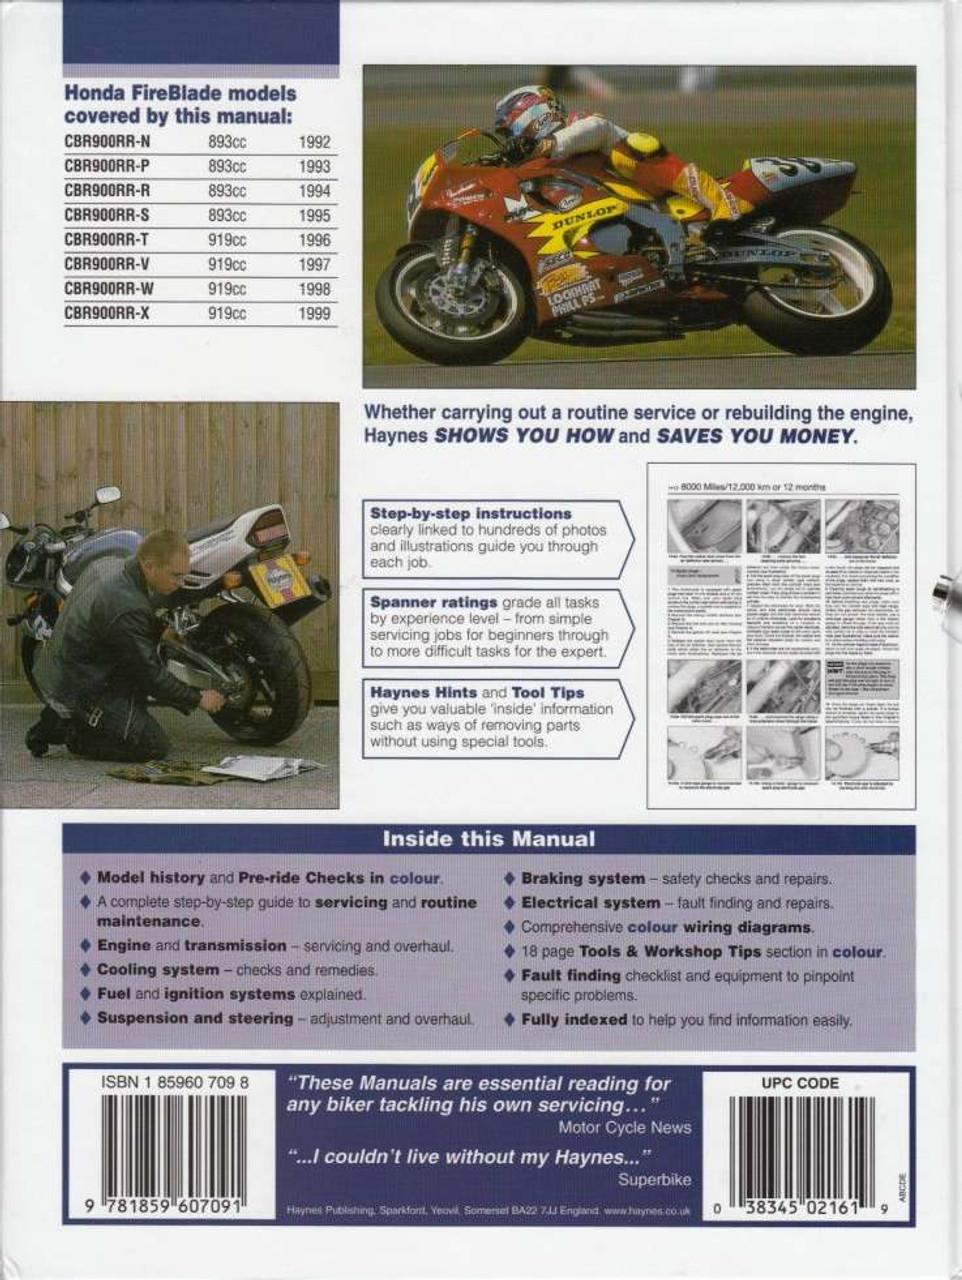 diagram of honda motorcycle parts 1999 cbr900rr a radiator diagram on honda lower unit diagram  [ 962 x 1280 Pixel ]